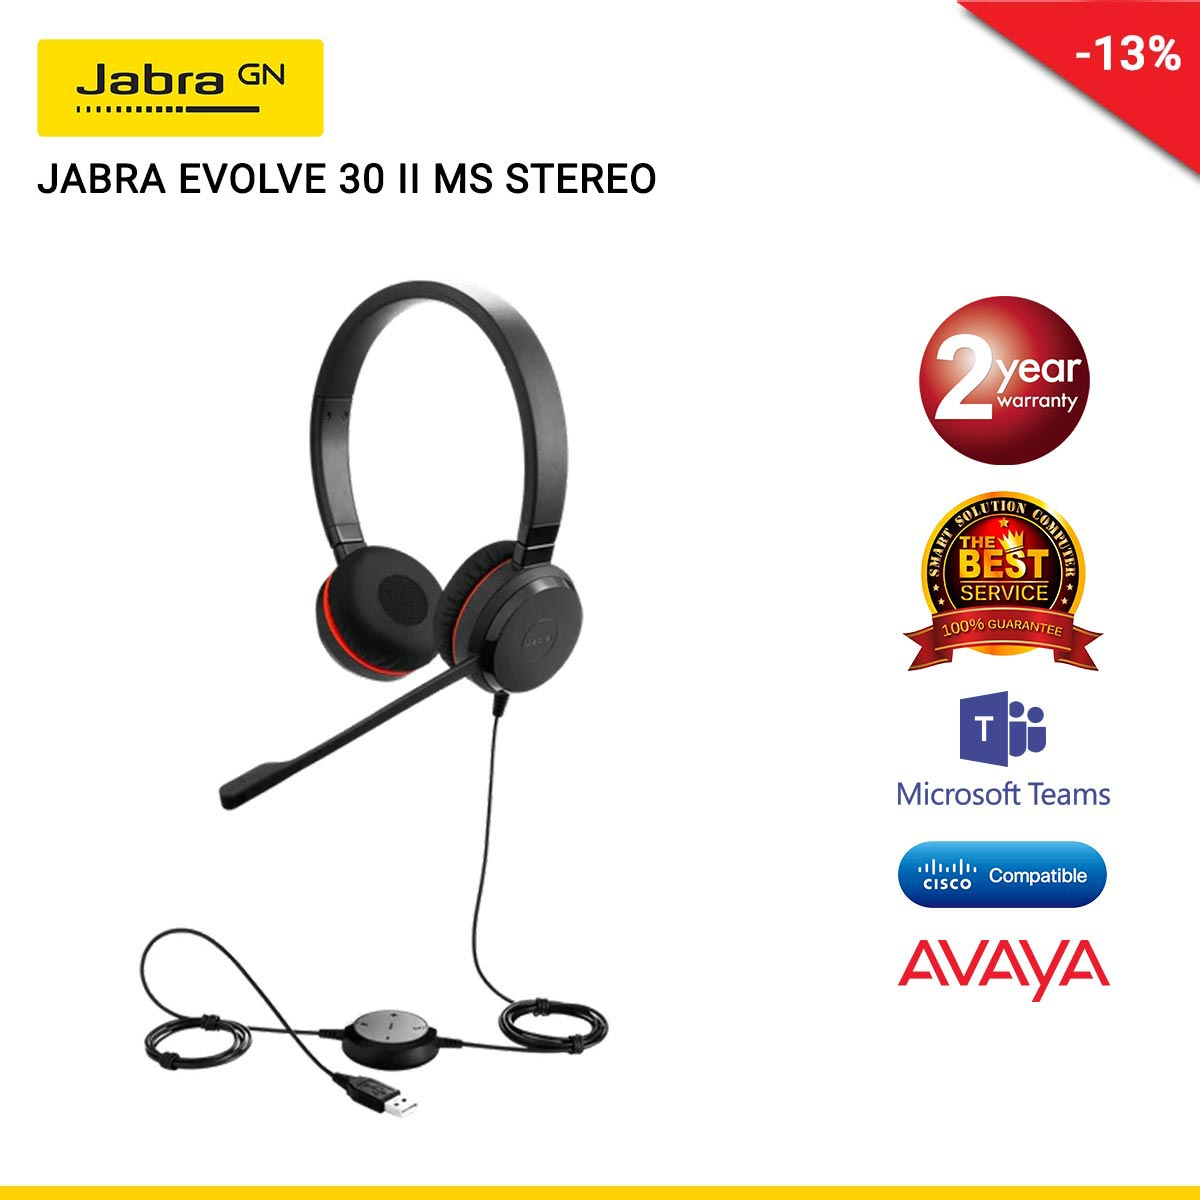 JABRA EVOLVE 30 II MS STEREO (JBA-5399-823-309)